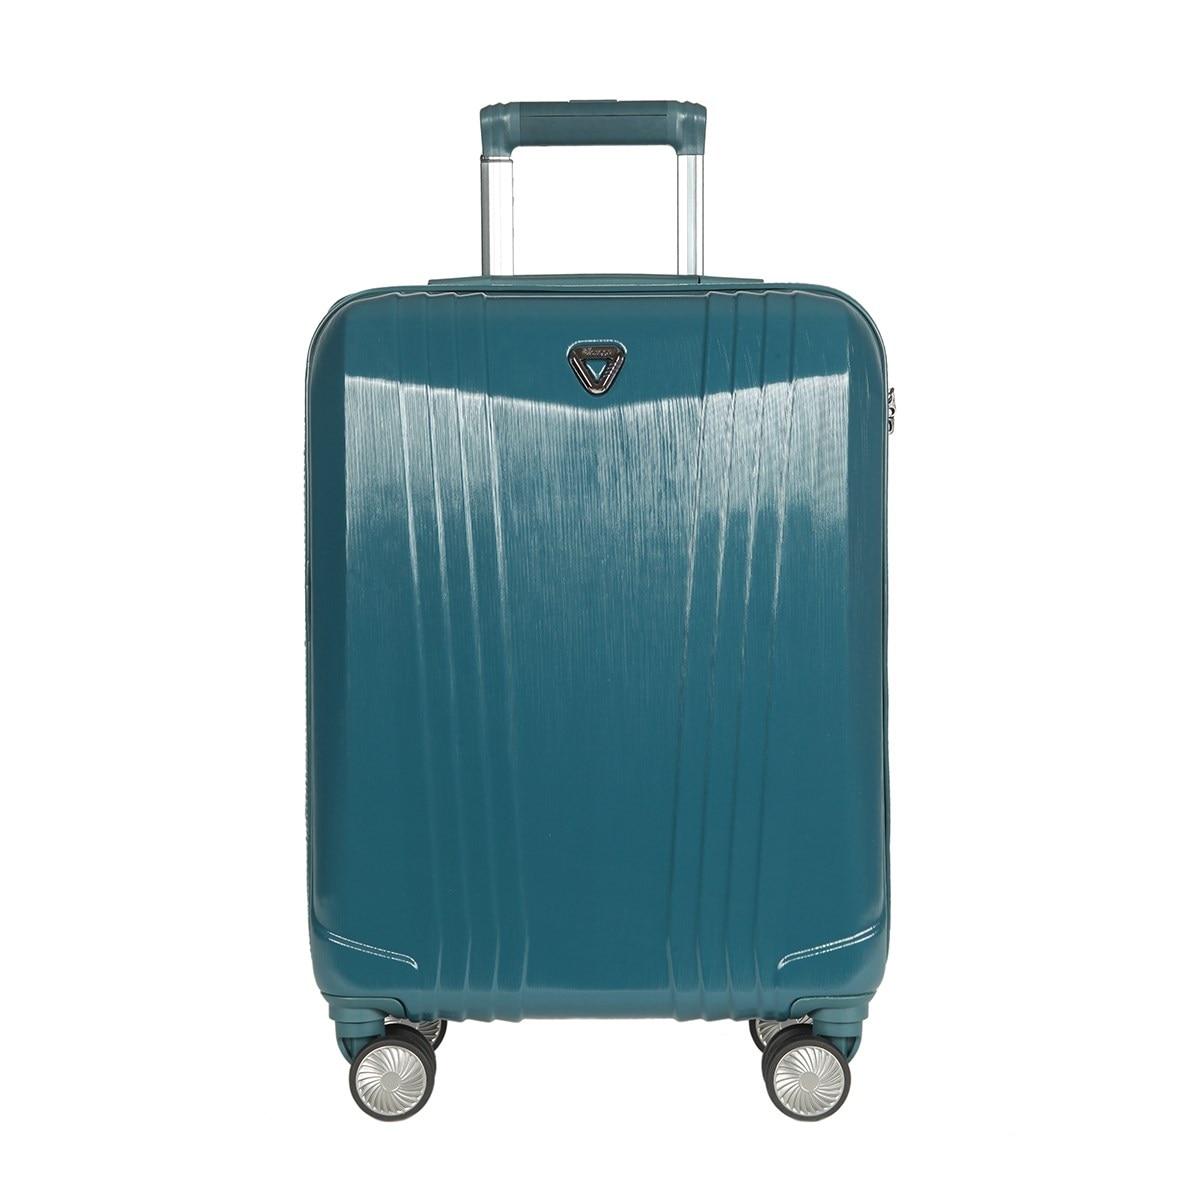 Suitcase-trolley Verage GM16091W19 green